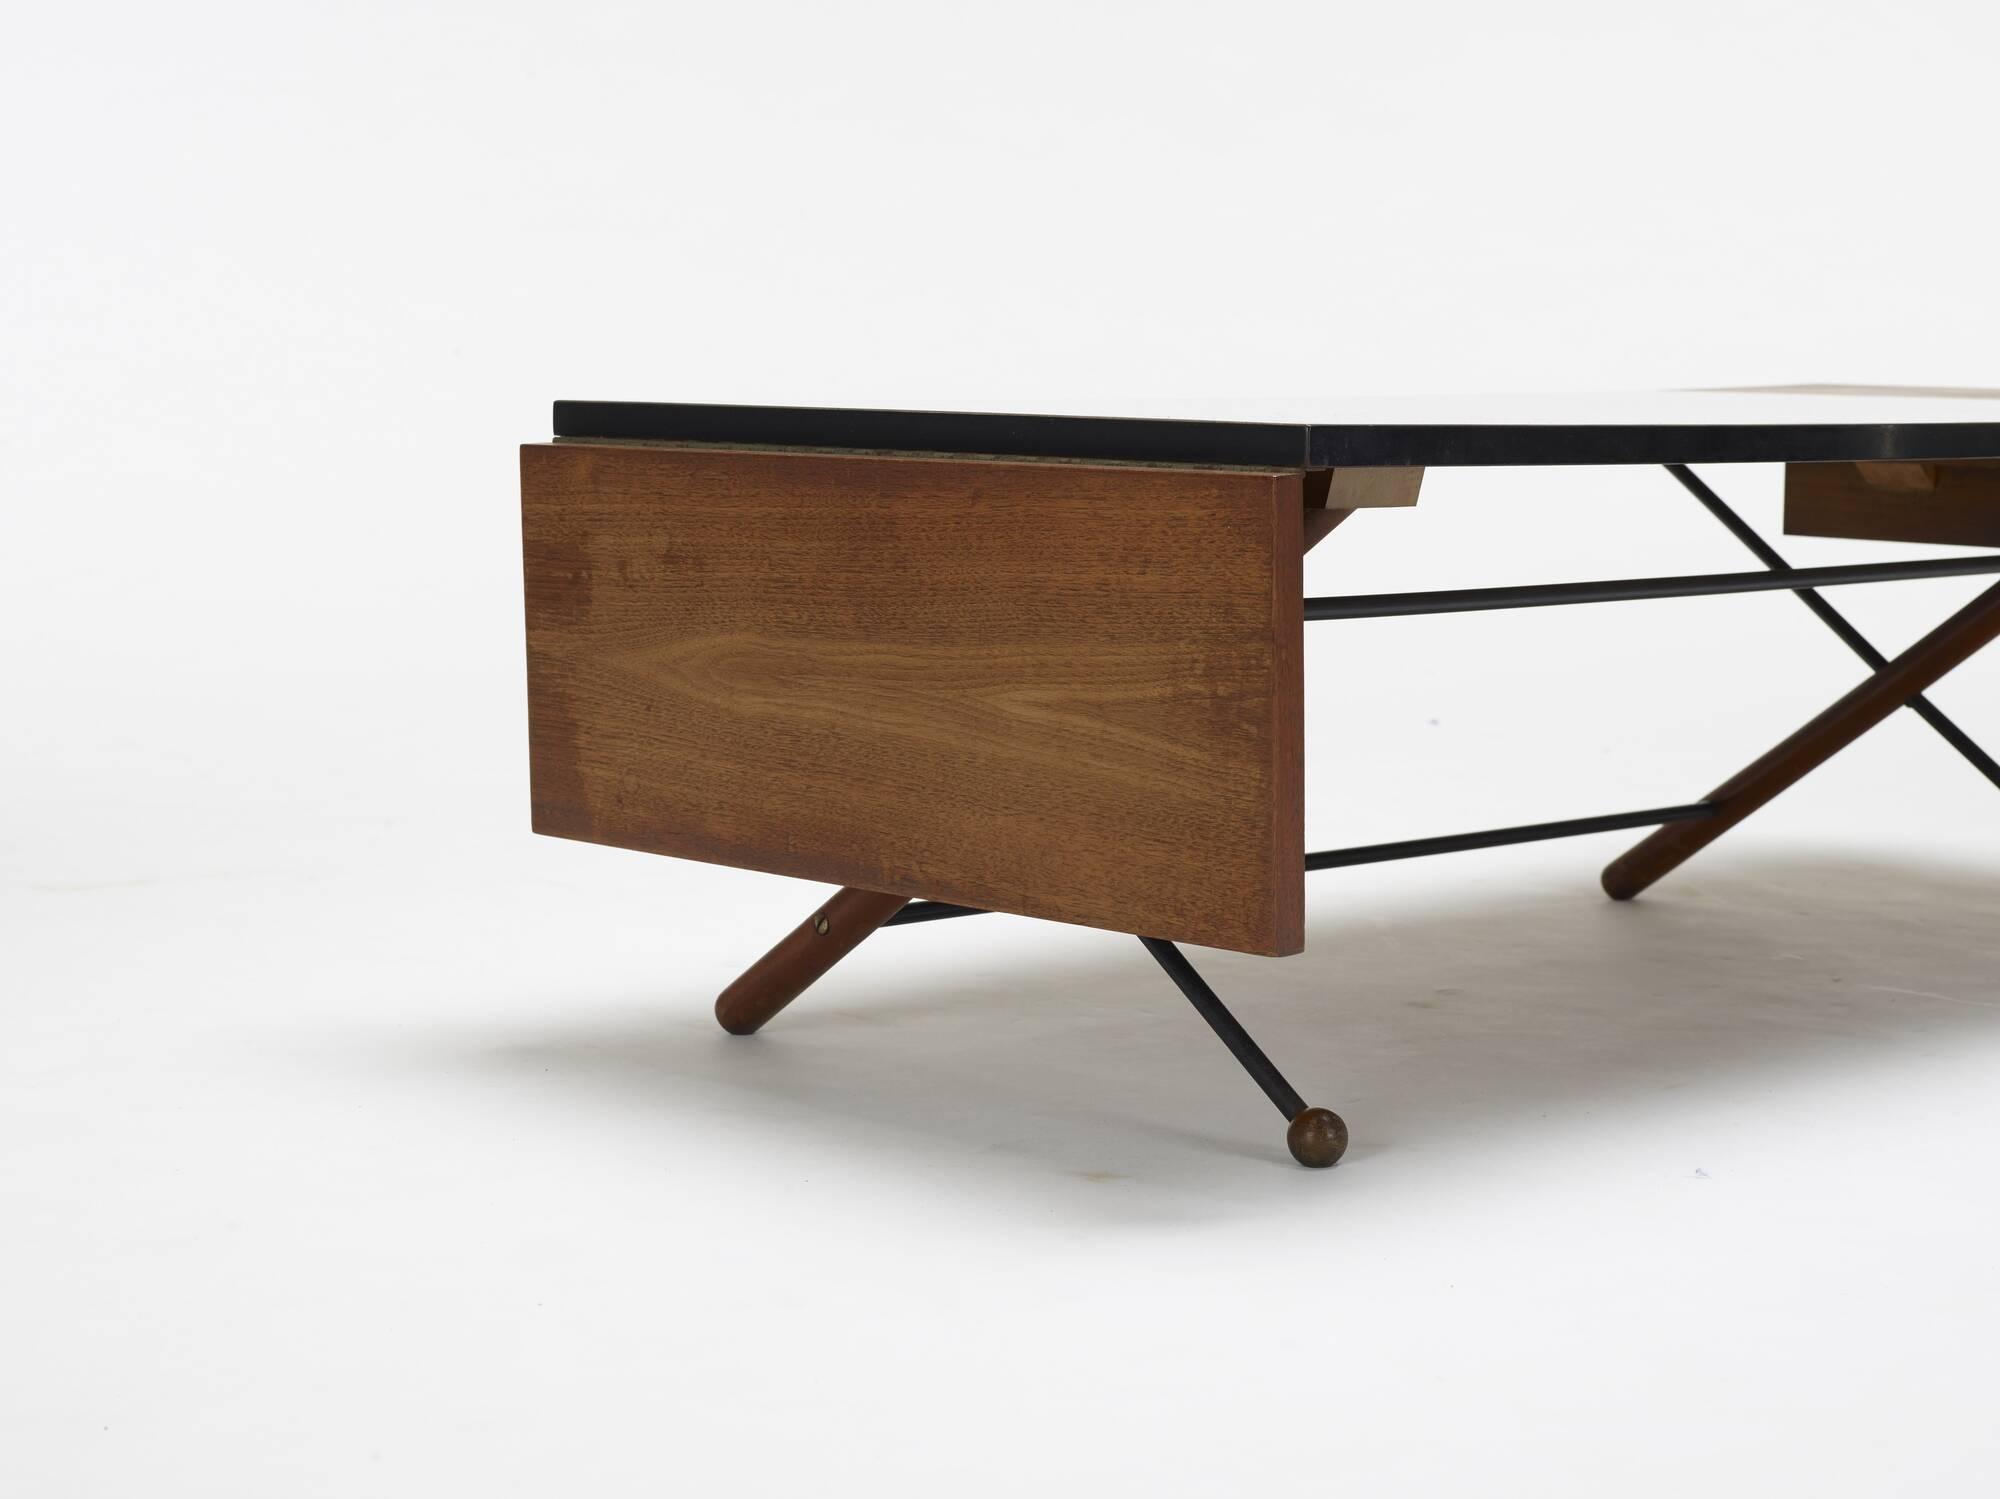 156 greta magnusson grossman coffee table design 26 october 156 greta magnusson grossman coffee table 5 of 5 geotapseo Gallery